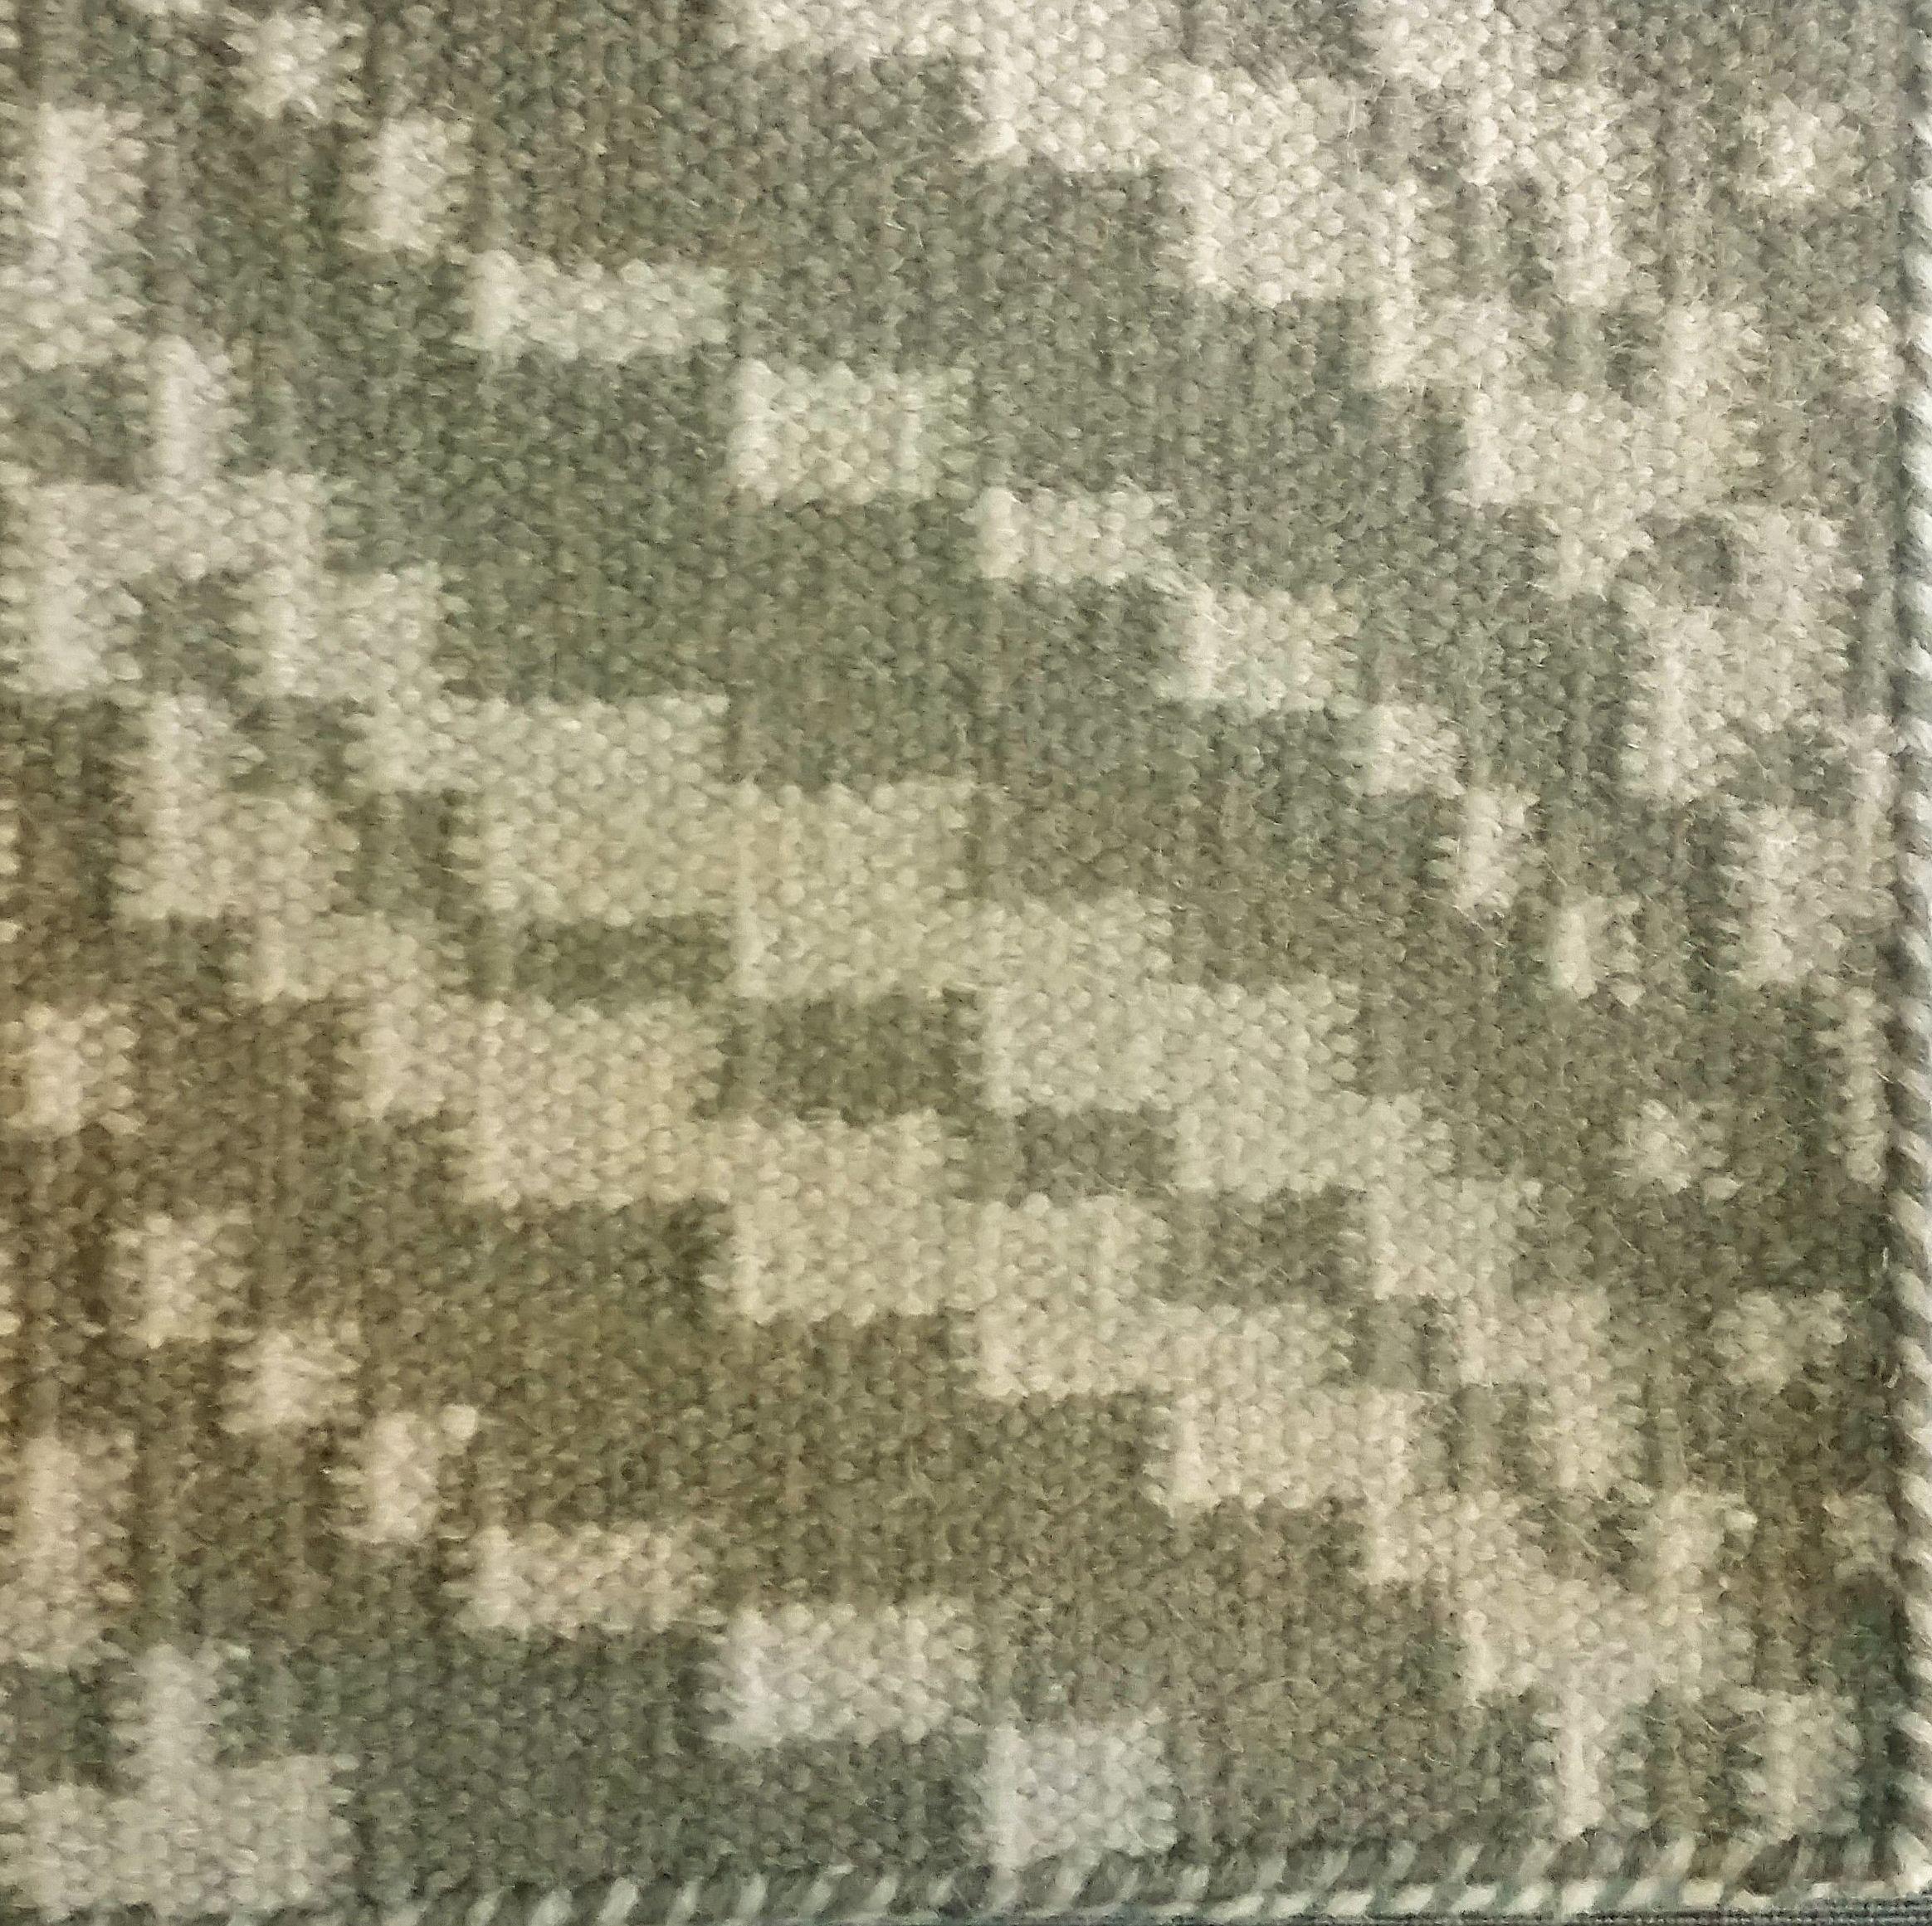 Foto 44 de Decoración textil en Madrid | Diseño Textil